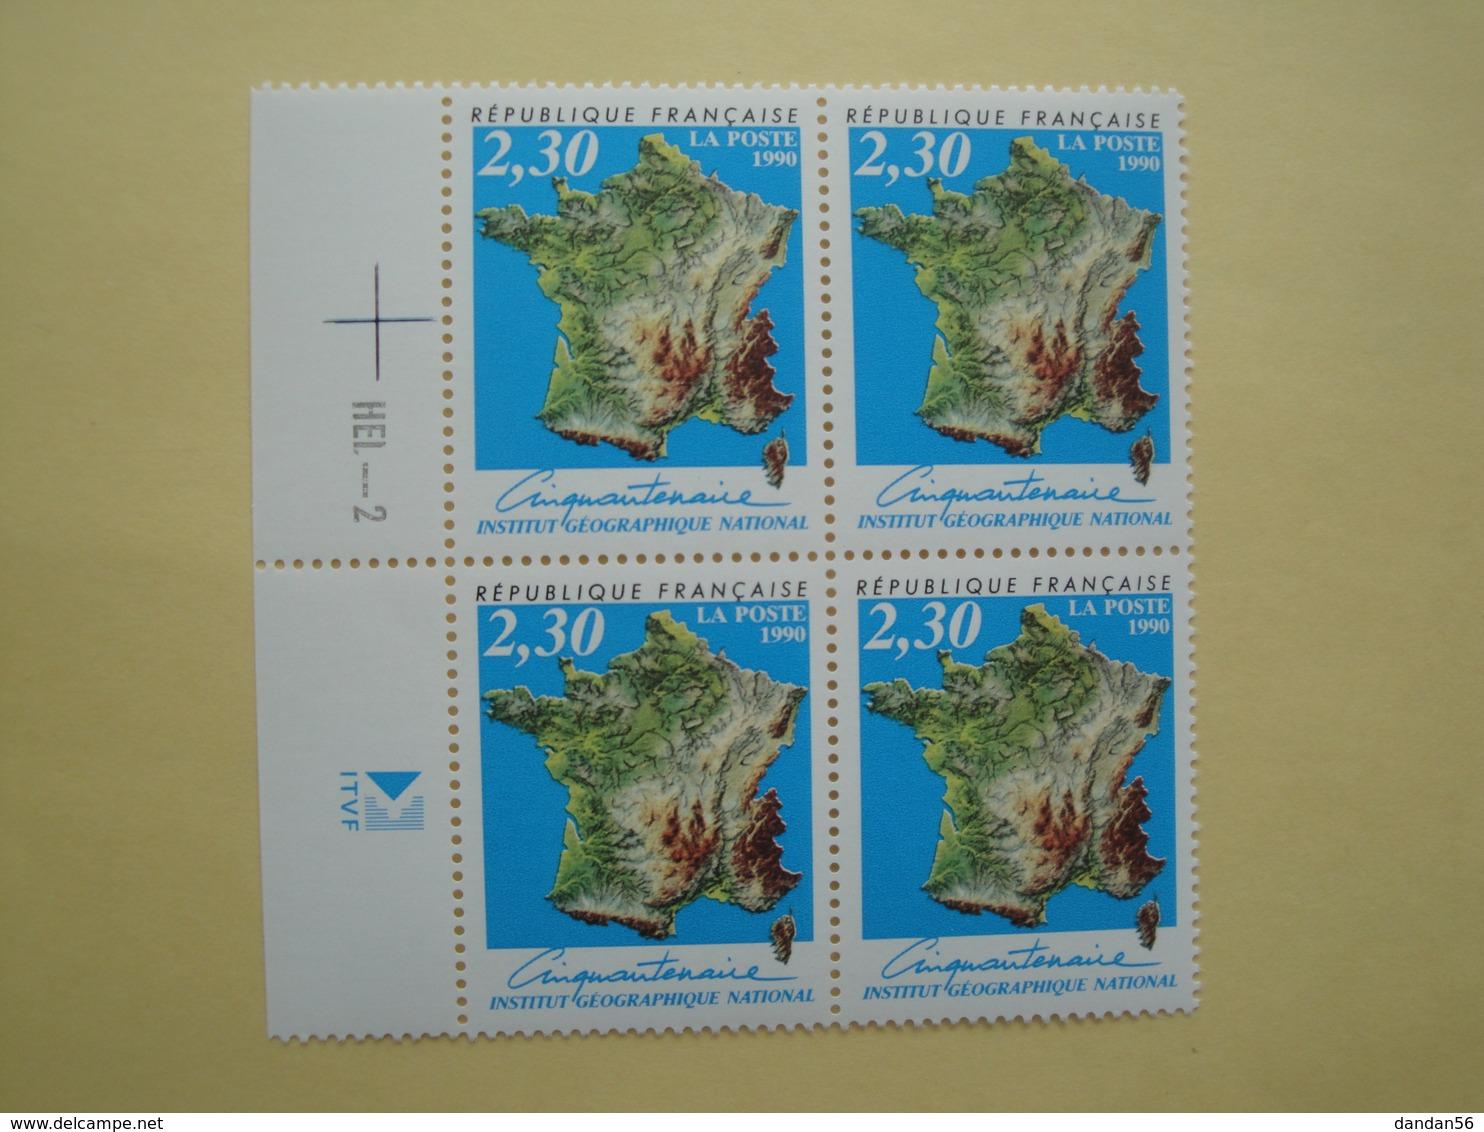 1990 France  Yv 2662 X 4 ** IGN  Carte De France  Cote 4.40 € Michel 2798 SG 3000  Map - Unused Stamps